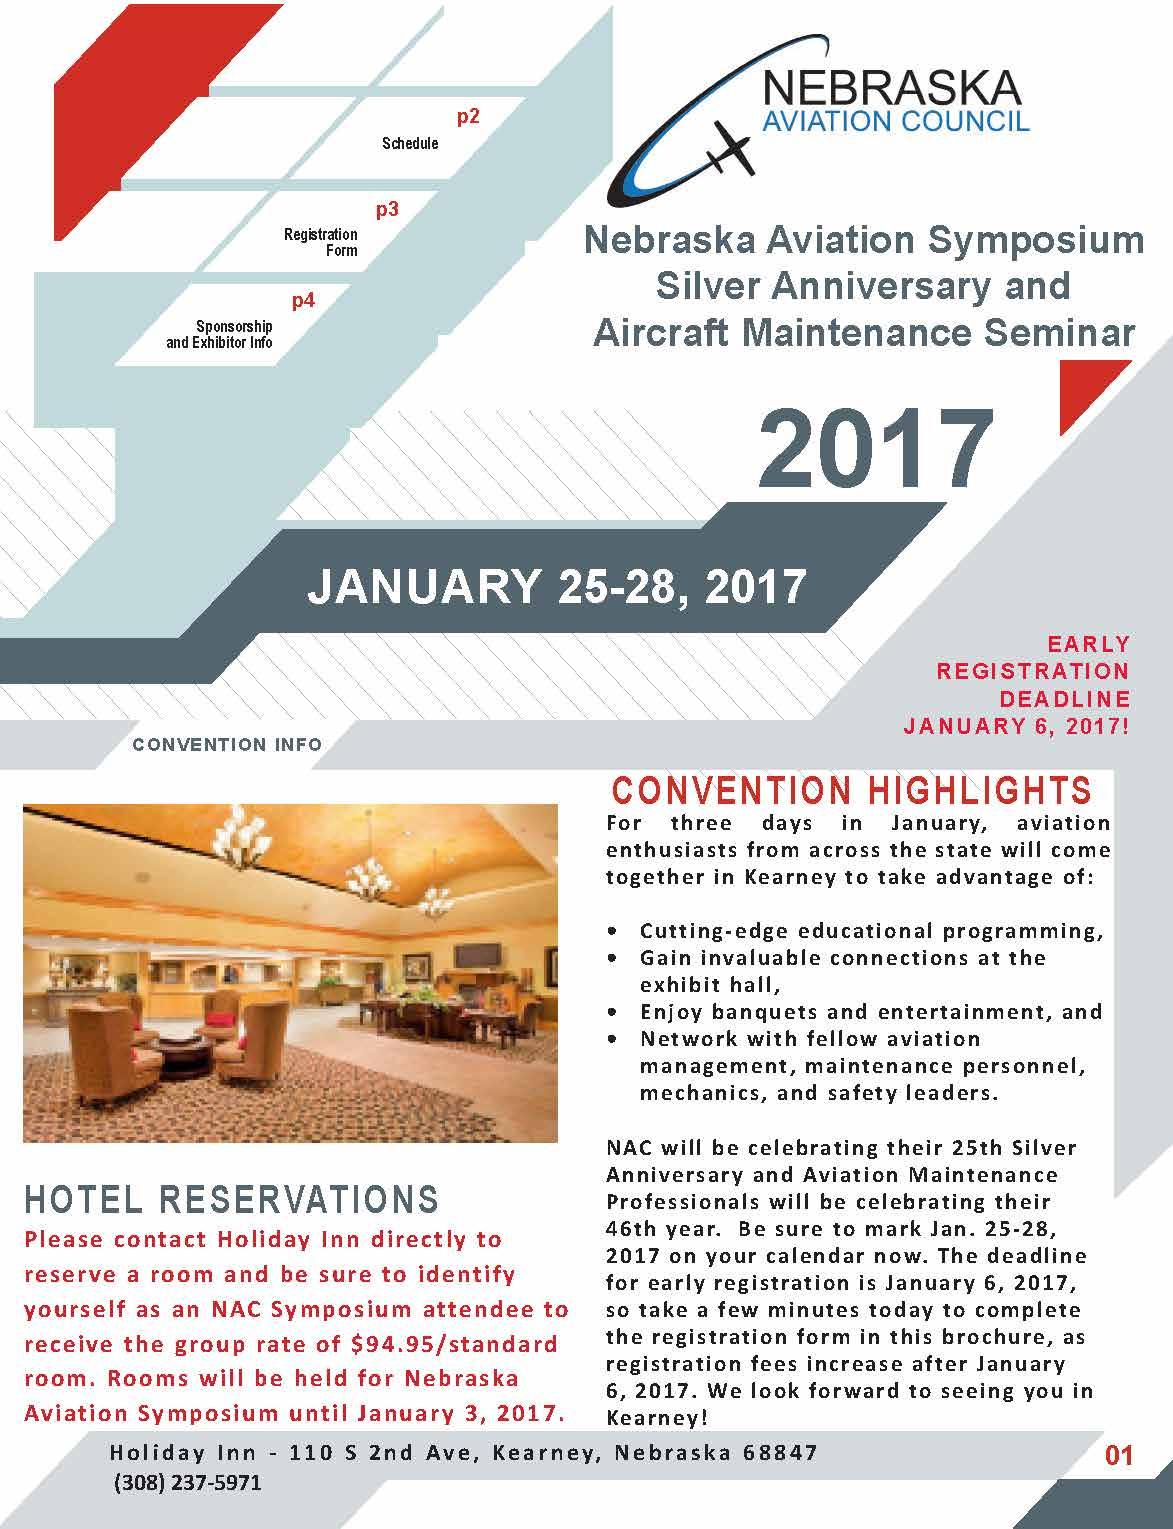 2017 Aviation Symposium Attendee Brochure1